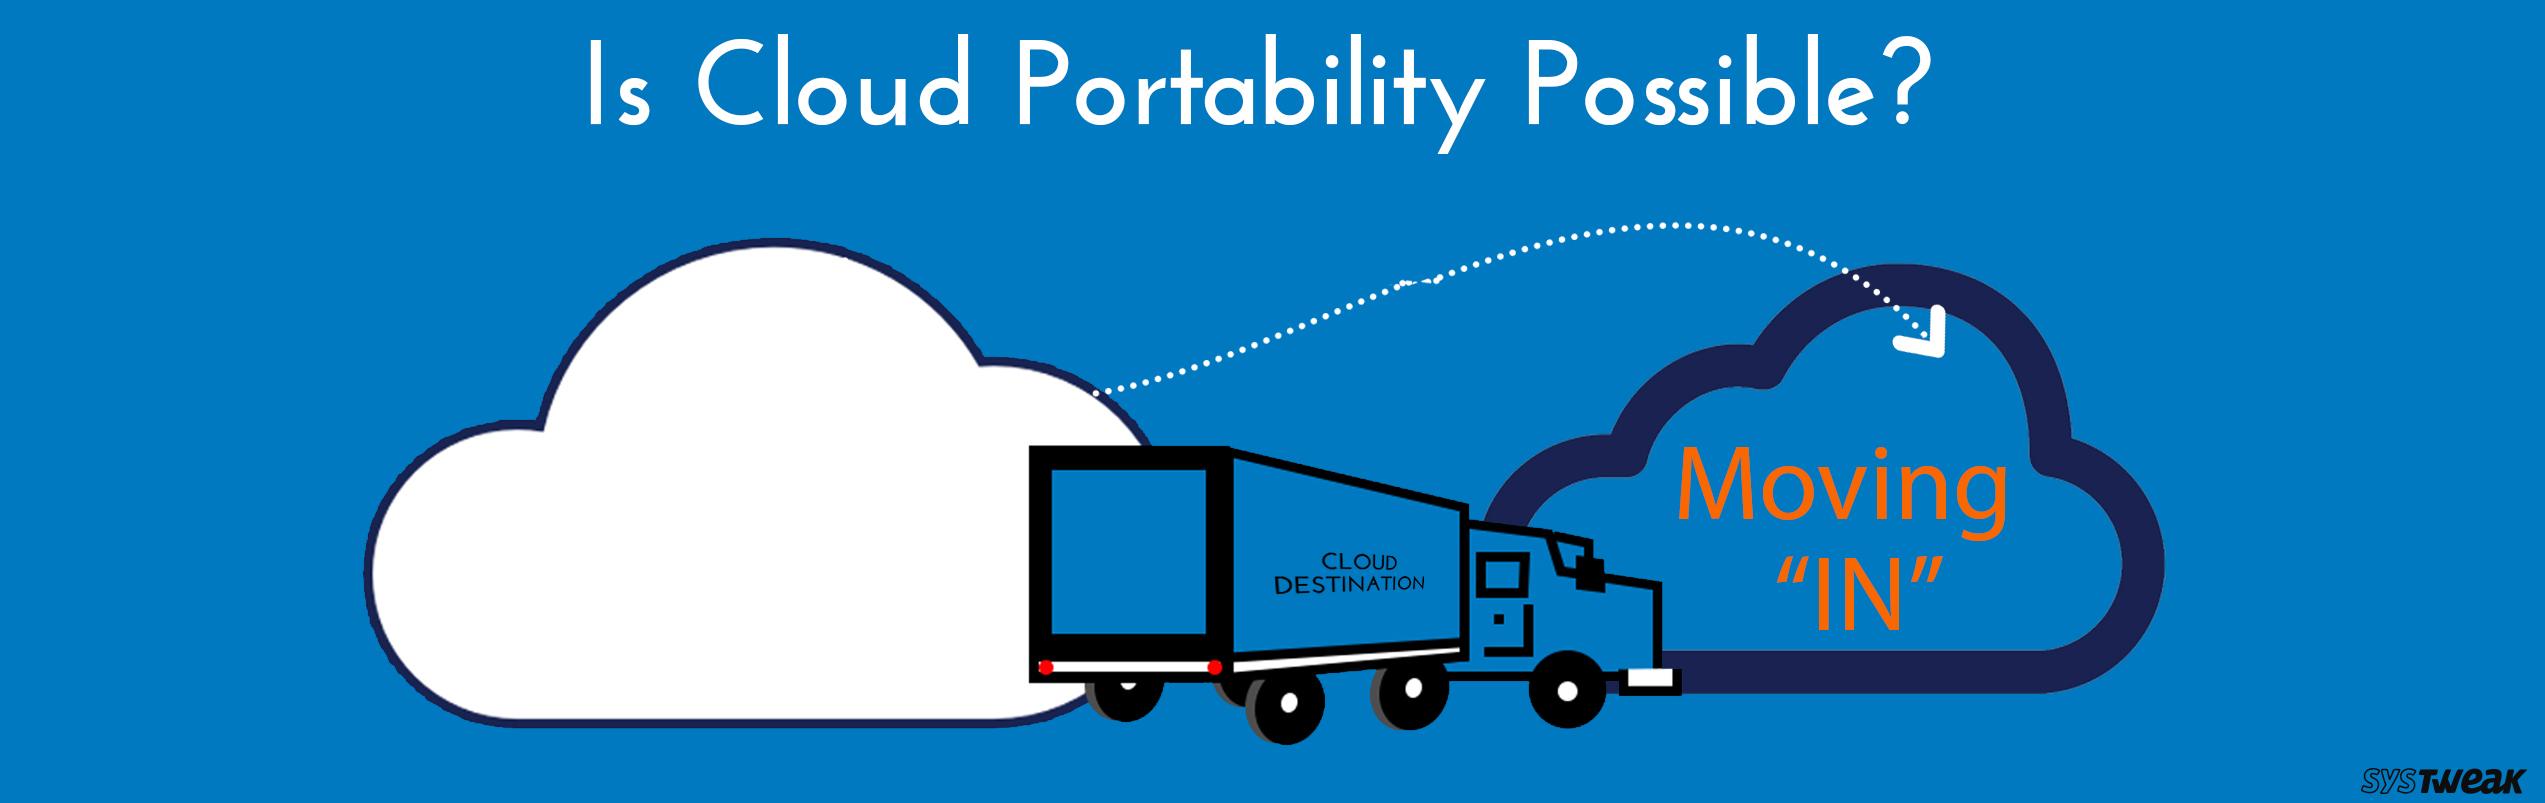 Cloud portability